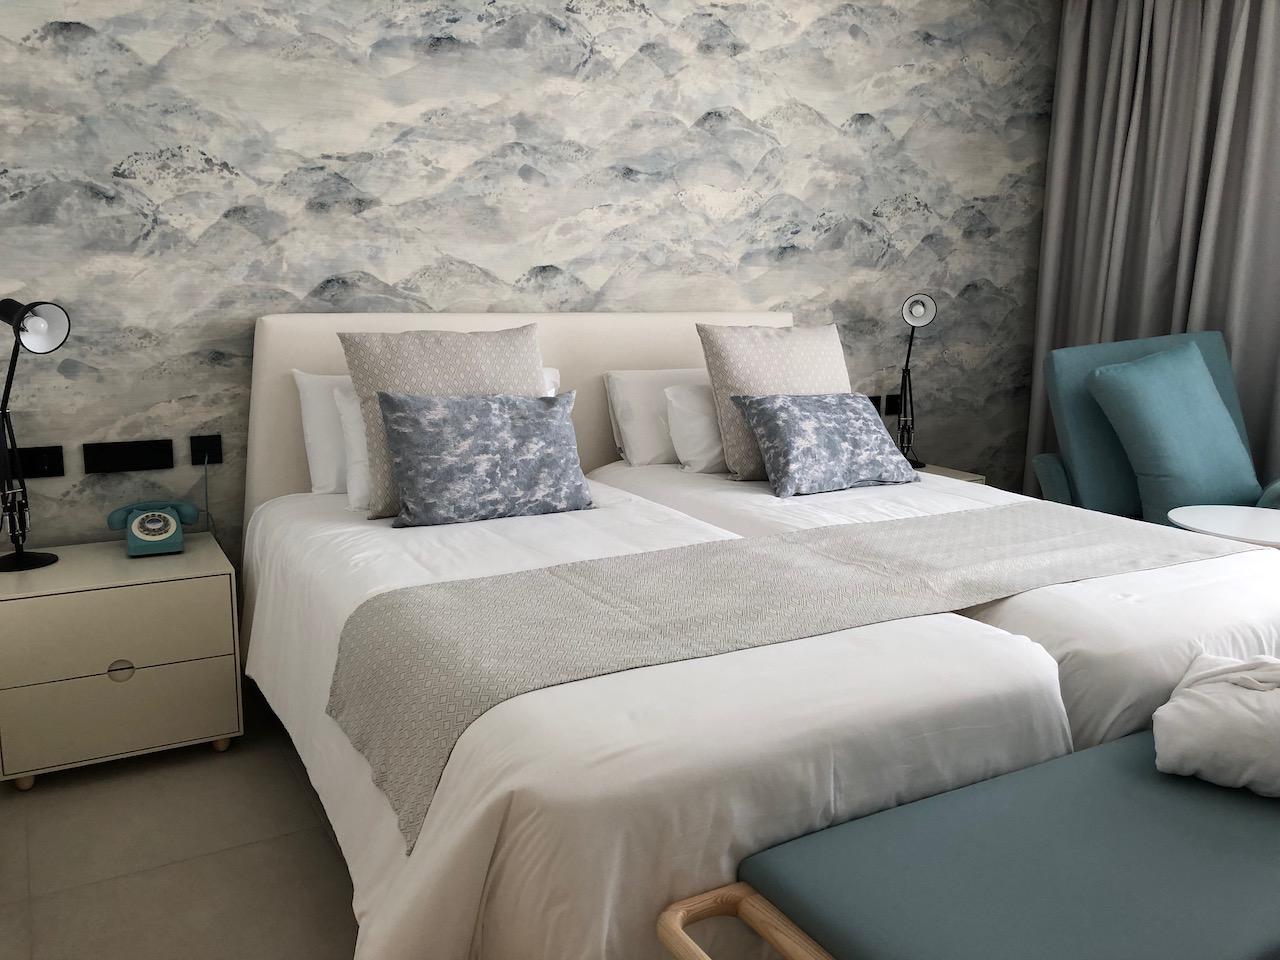 Lava Beach Hotel Double Room